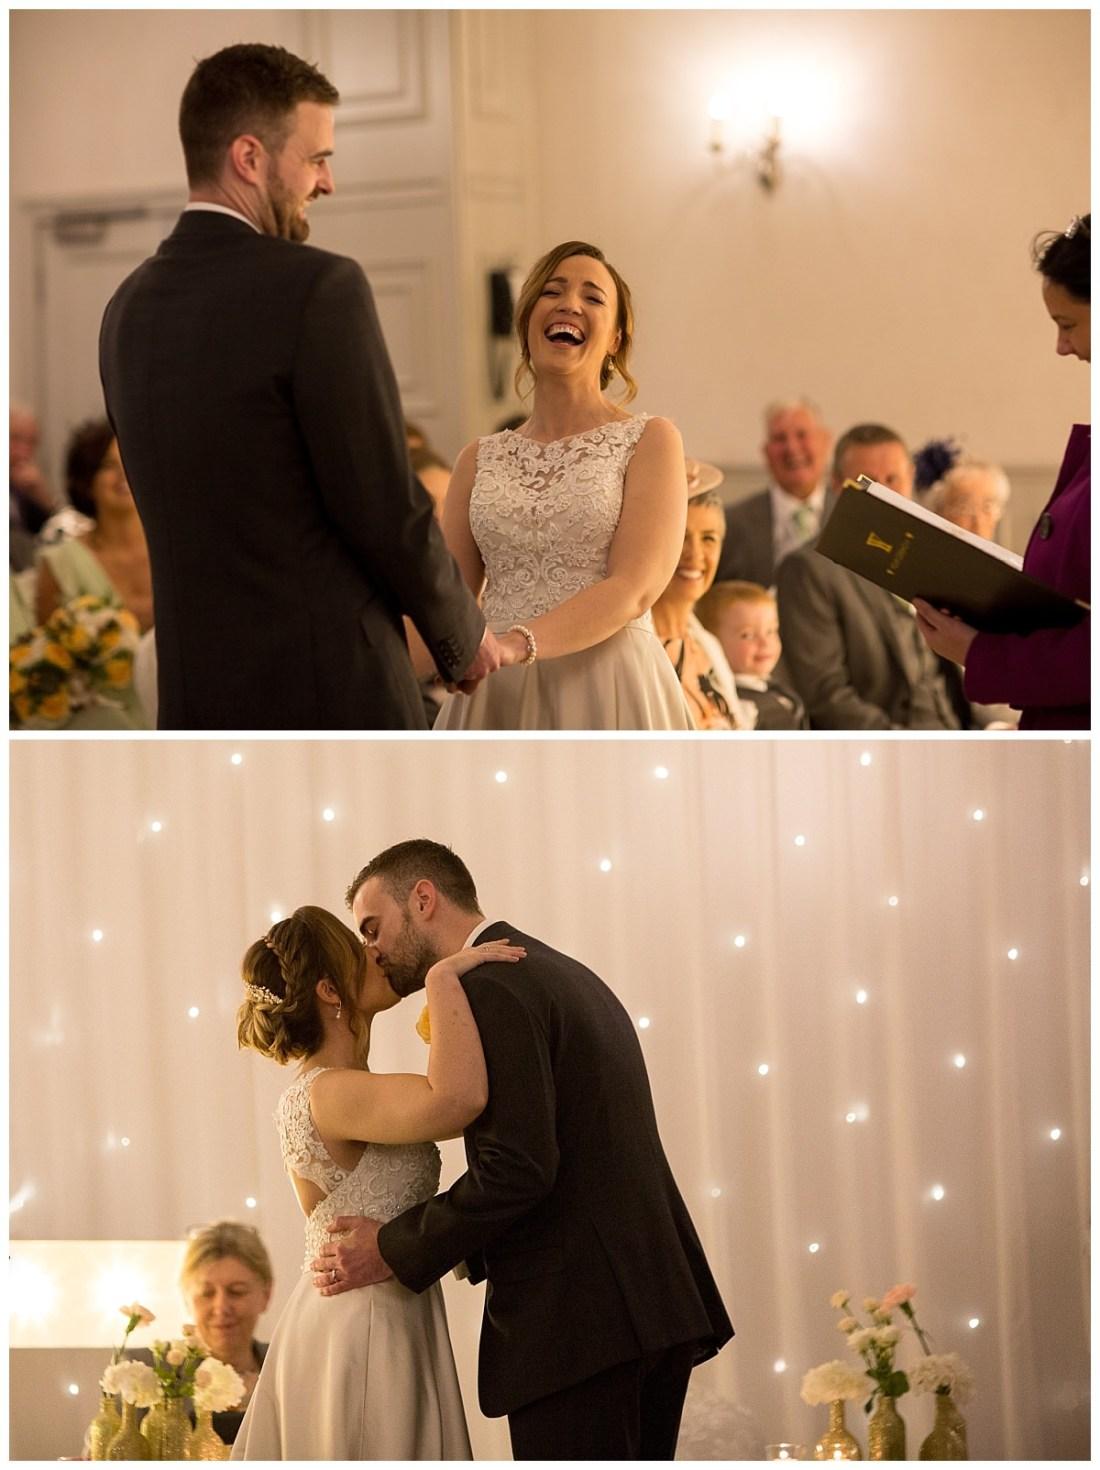 Wedding Ceremony at Mottram Hall